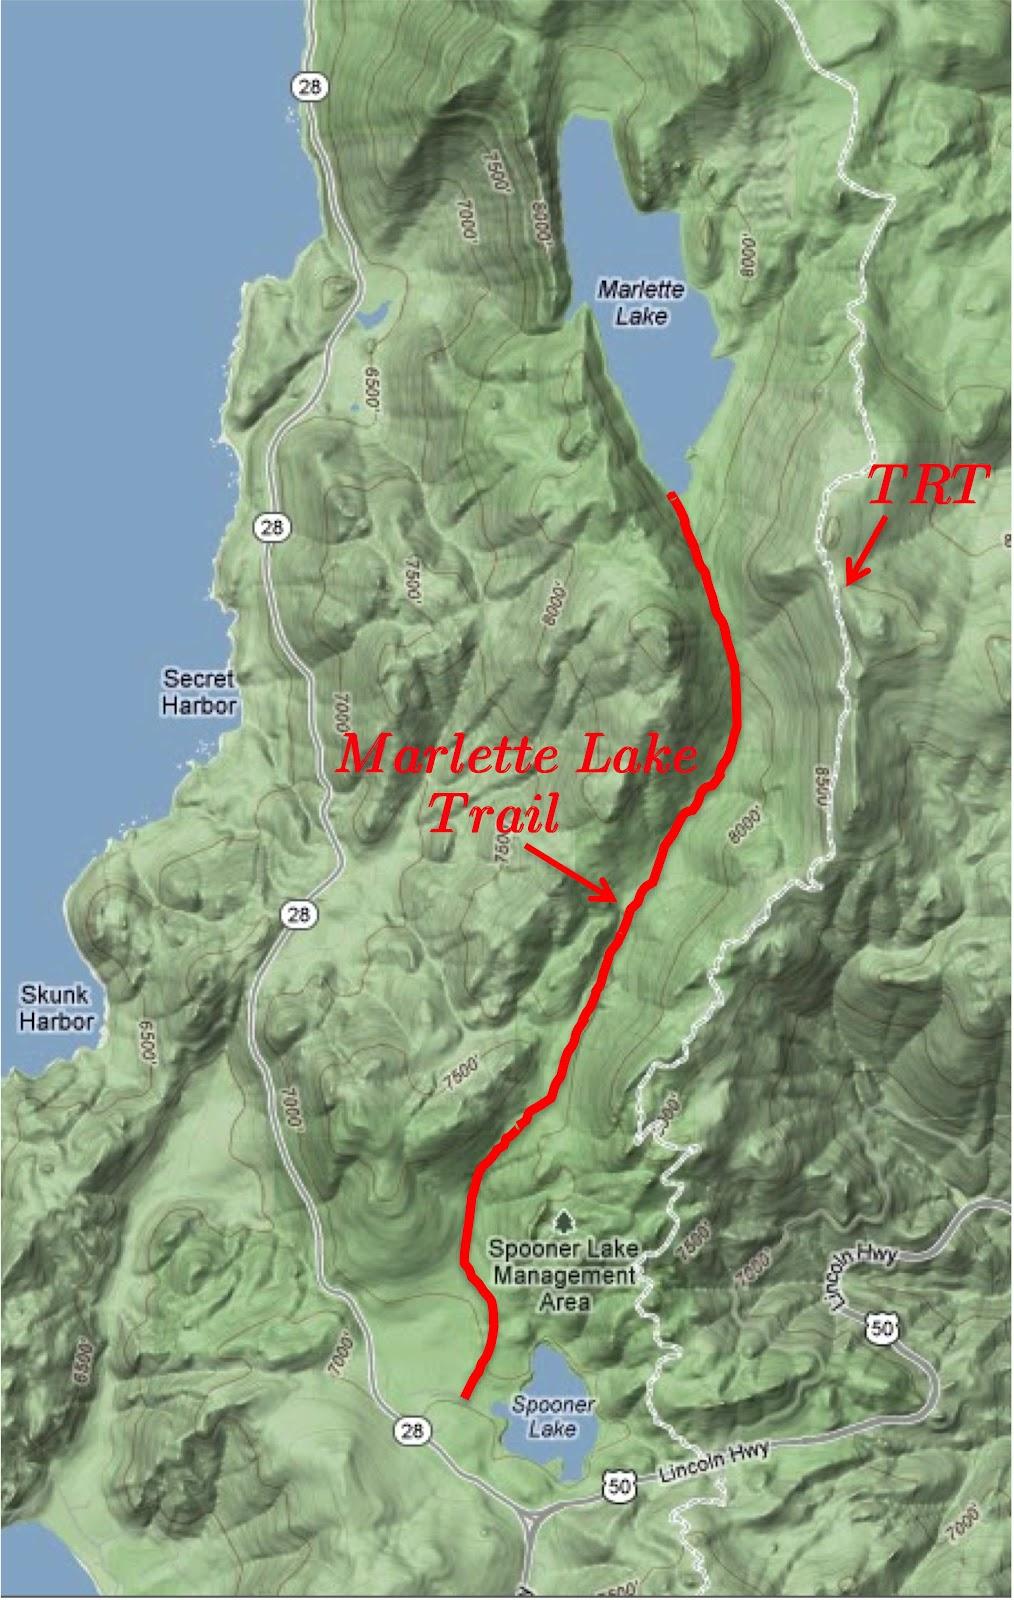 Marlette Lake Trail Tahoe Ekayasolutions